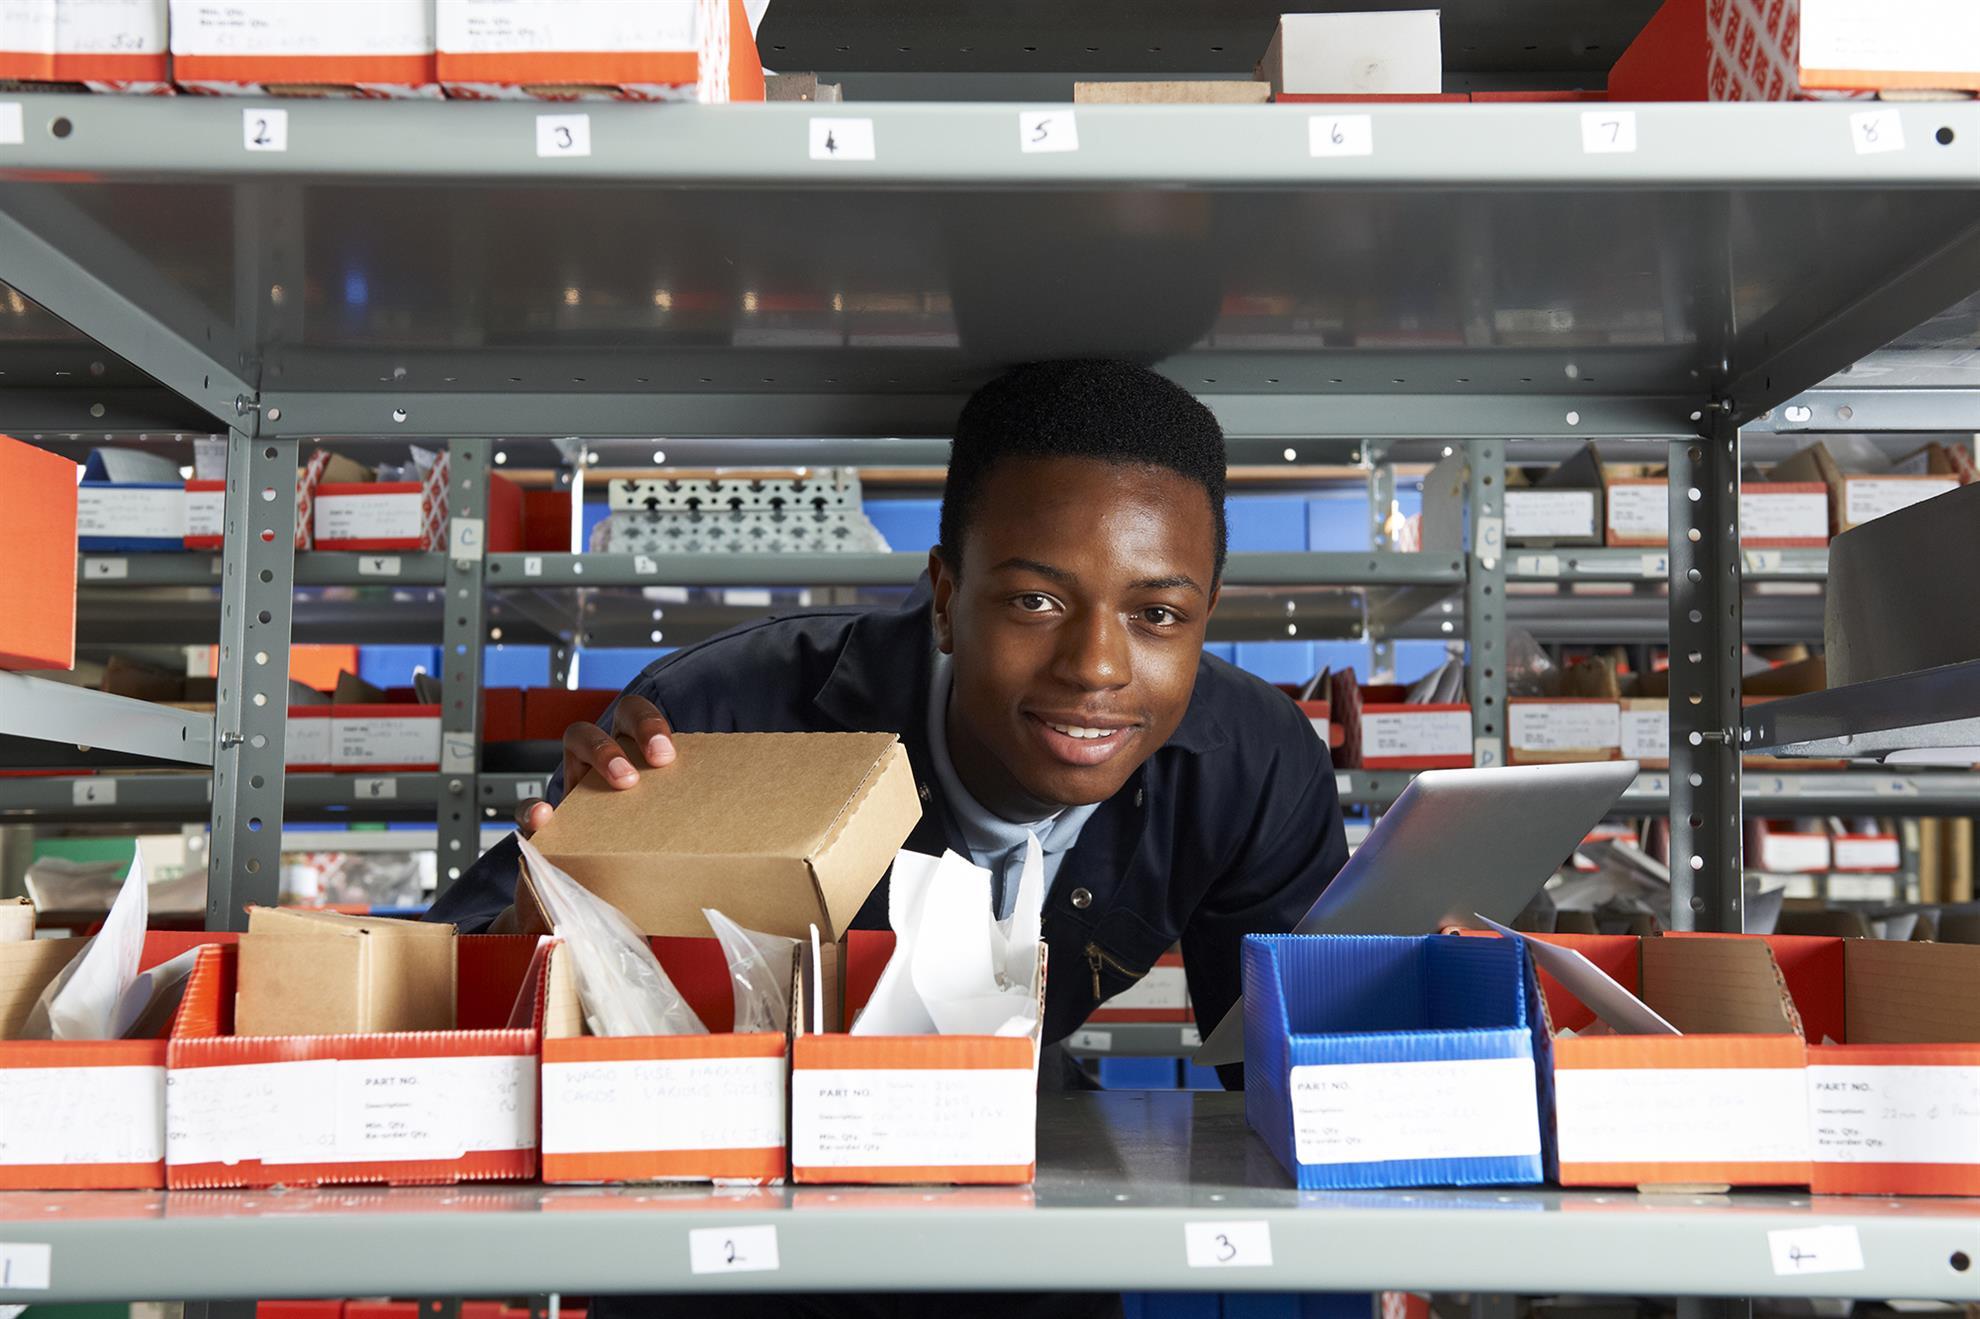 Teen Stocking Shelf at Job